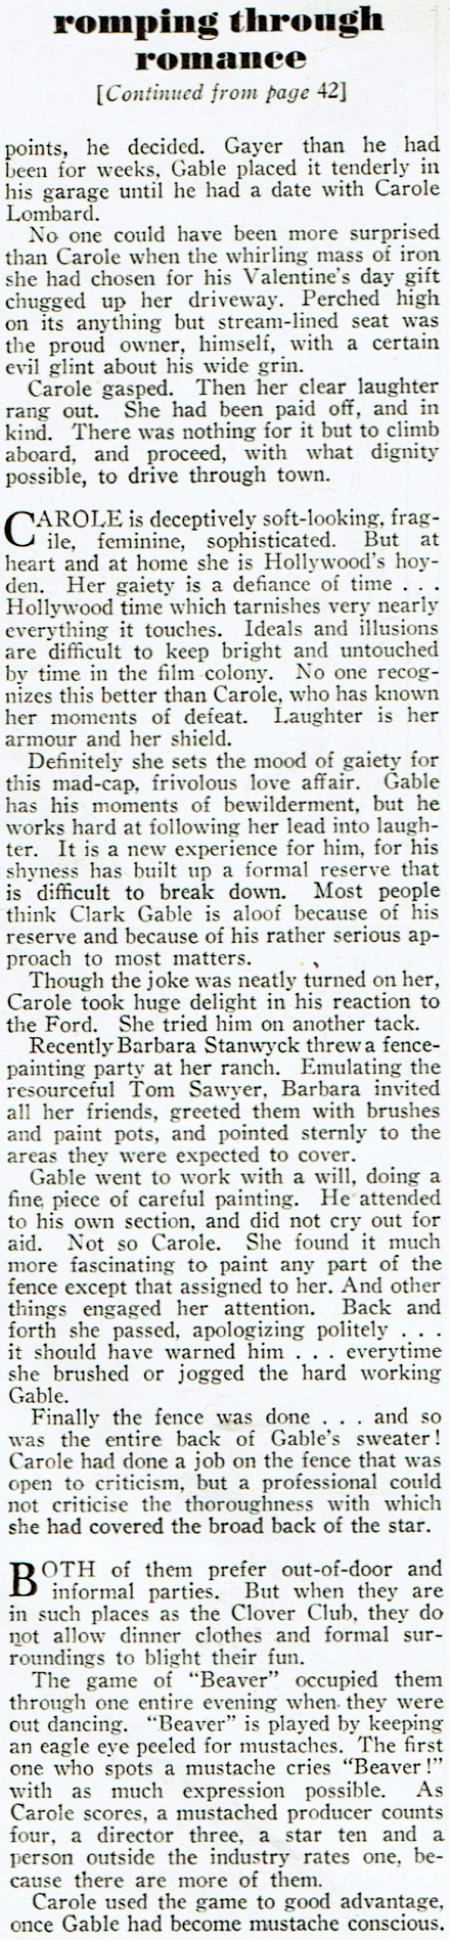 carole lombard screen play march 1937ca